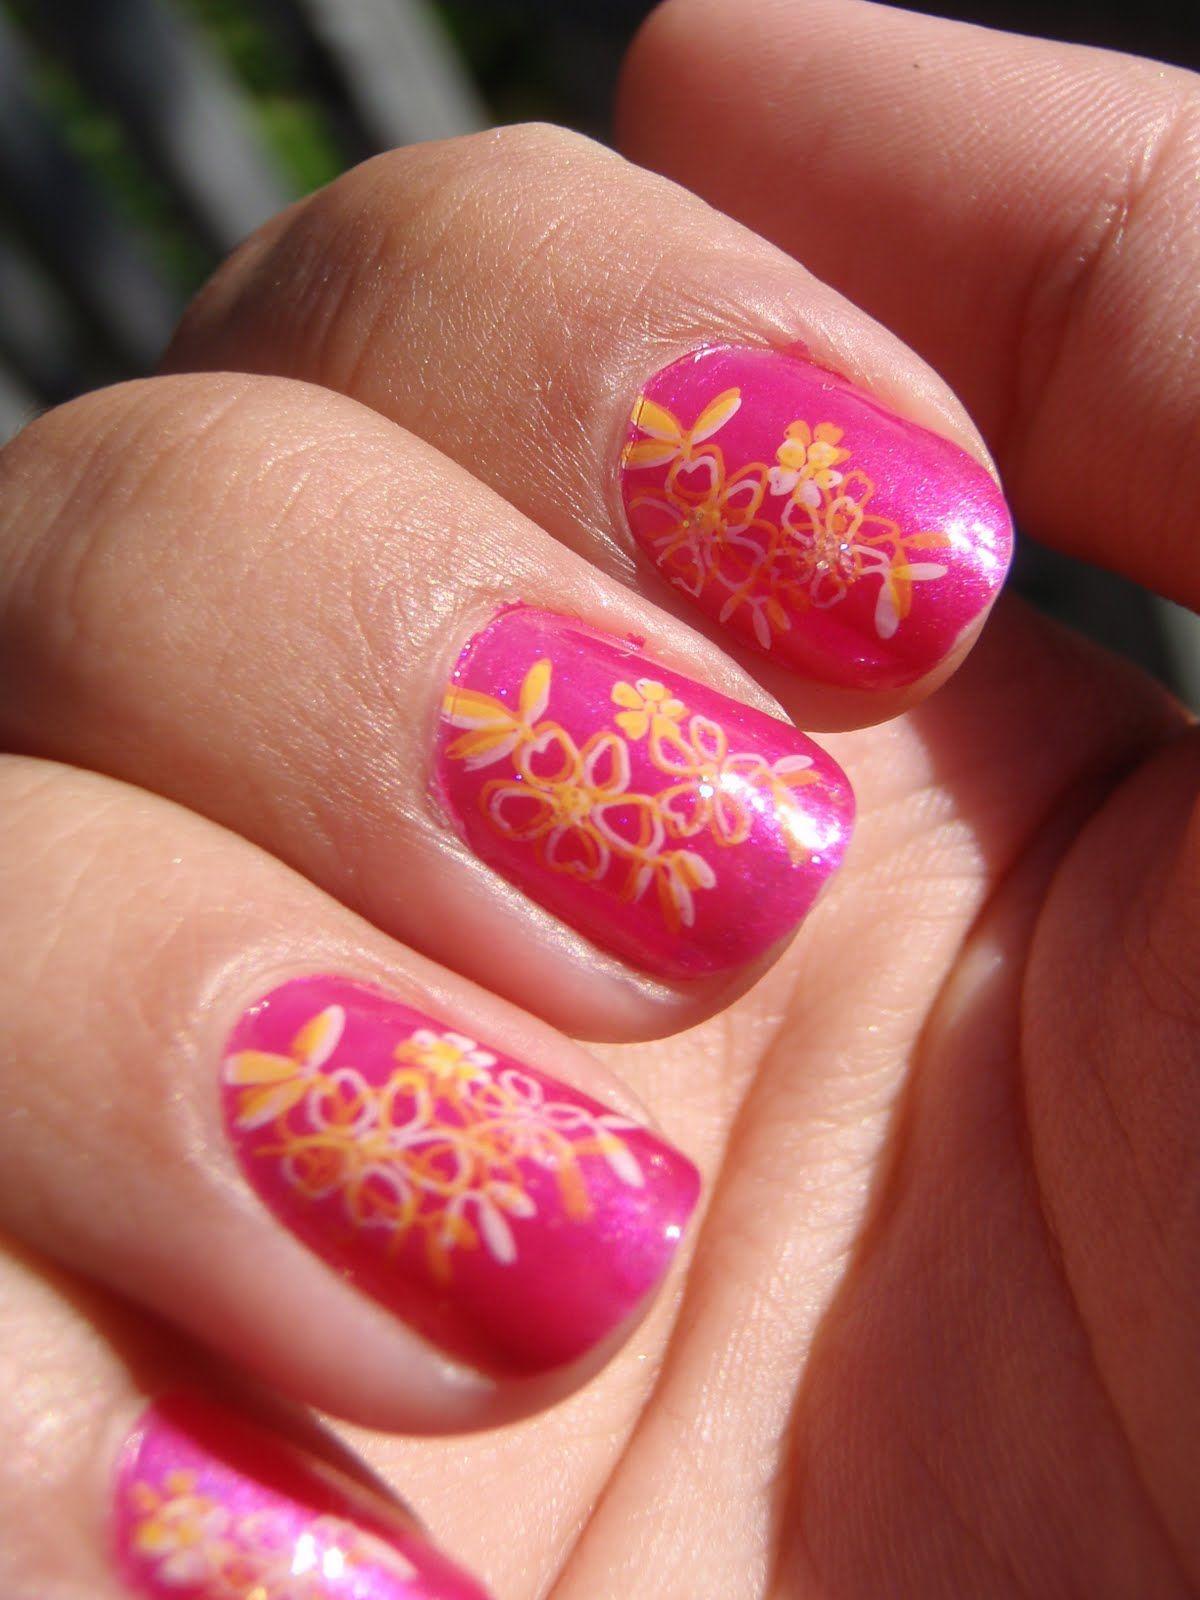 Nailhawaiianflowers nail junkie hawaiian pink flowers review nailhawaiianflowers nail junkie hawaiian pink flowers review izmirmasajfo